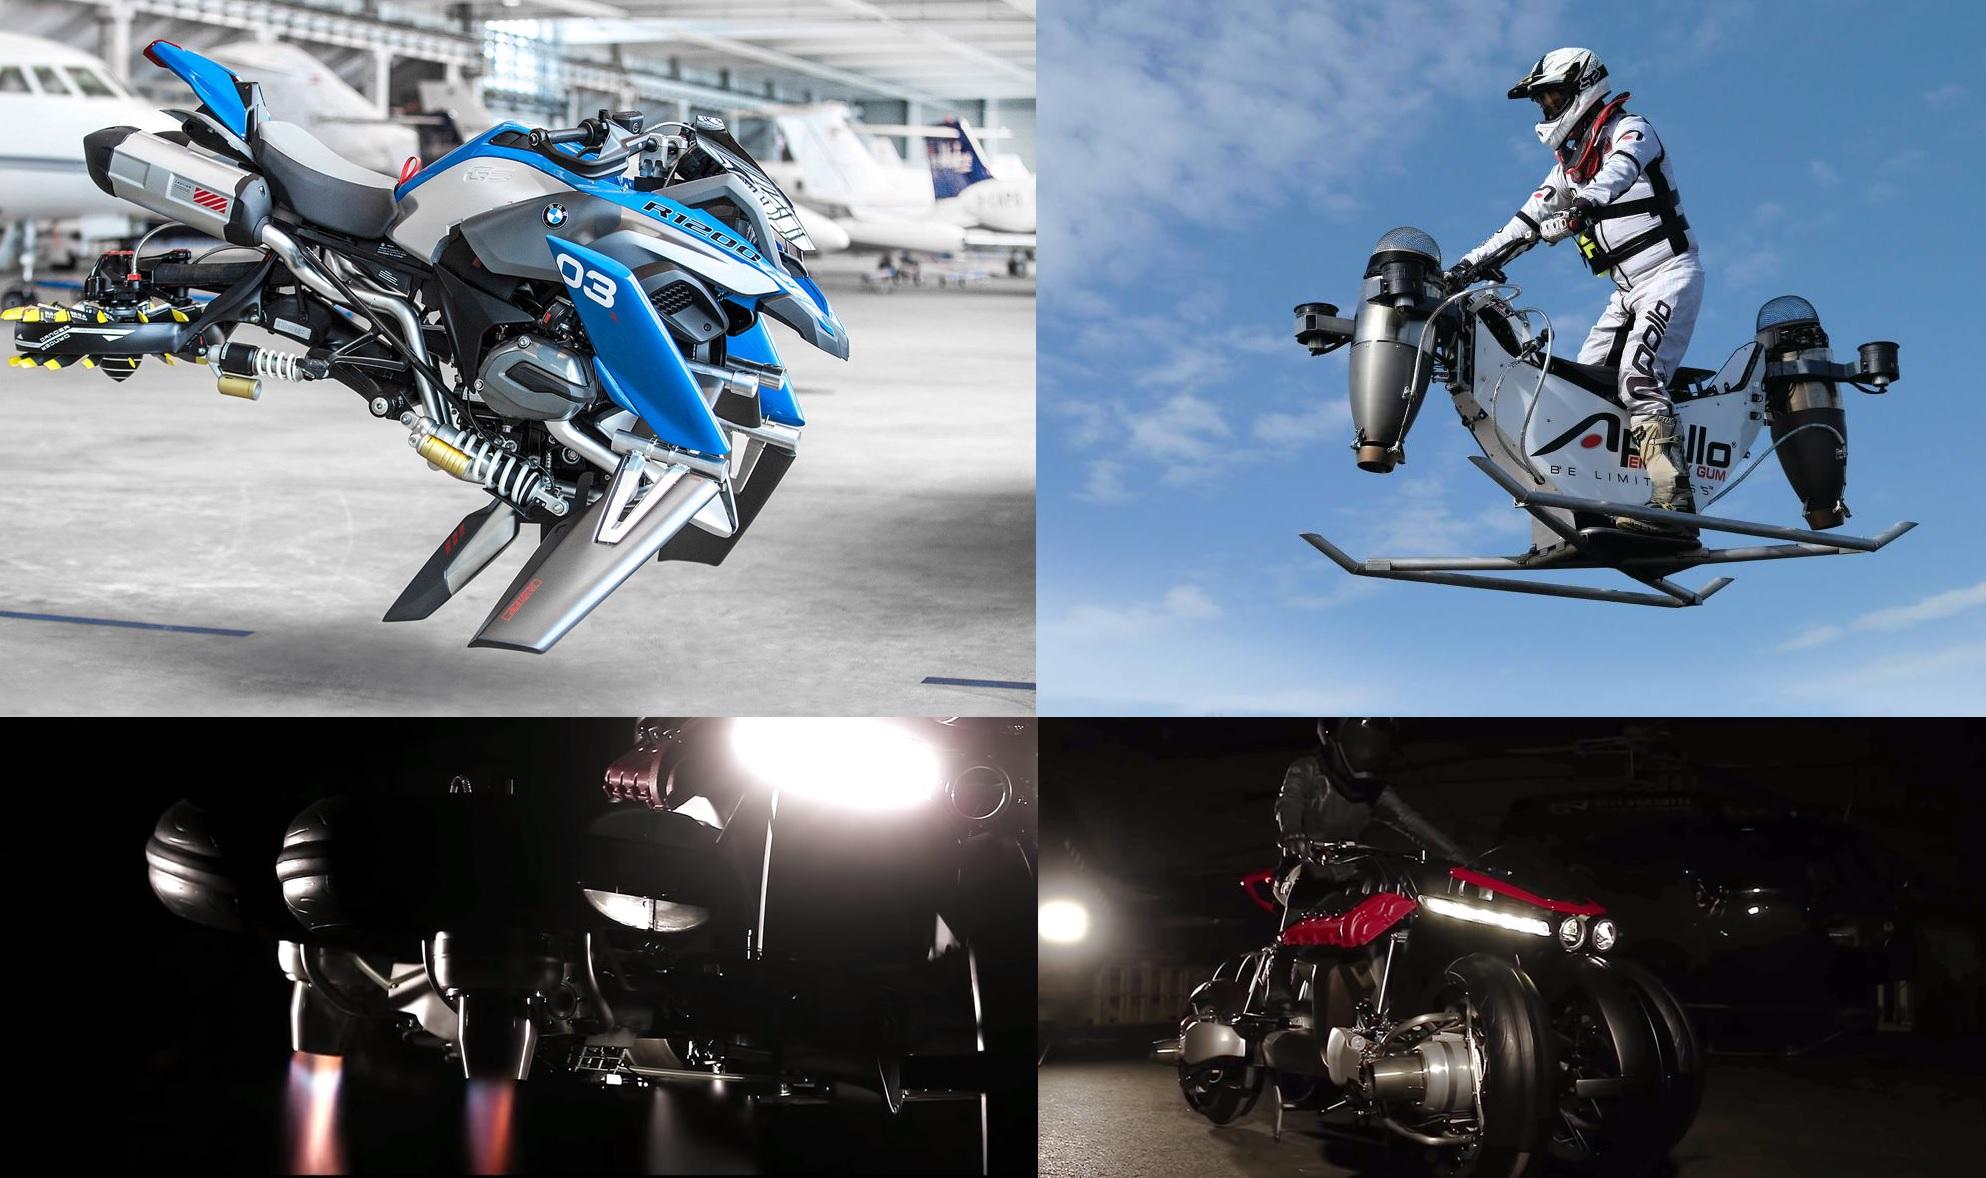 Turbojet bikes